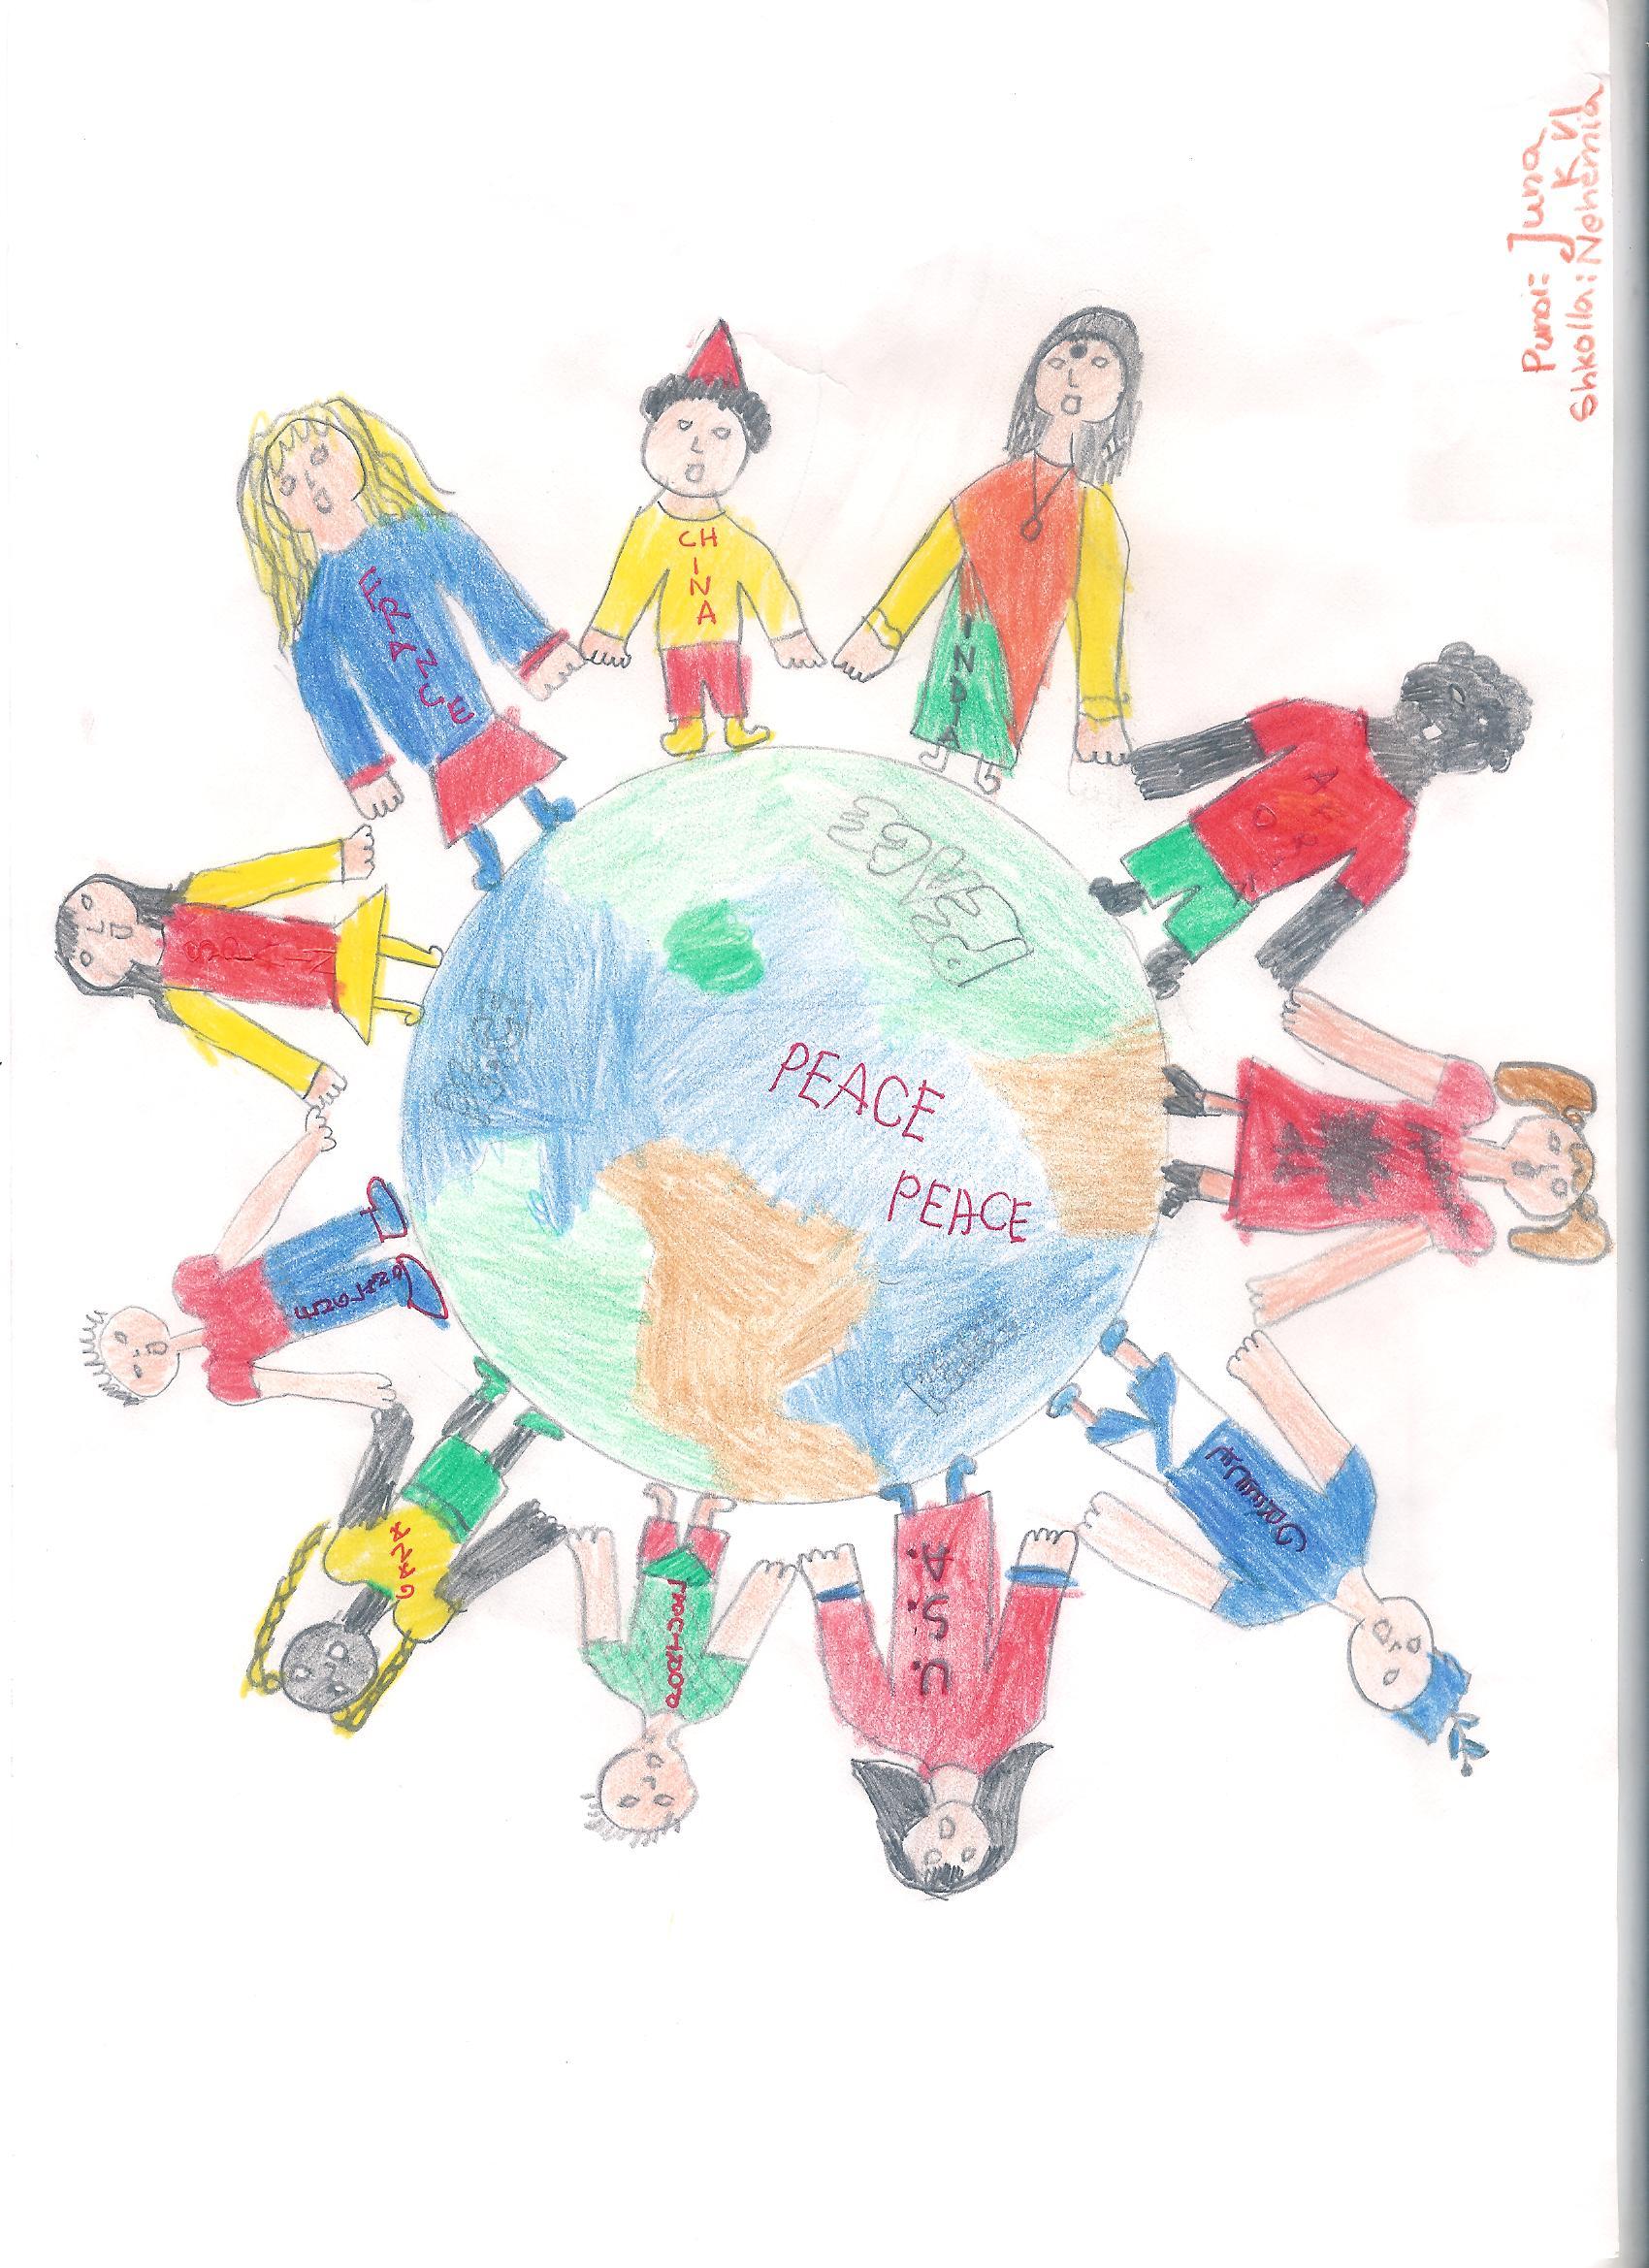 World Peace Drawings